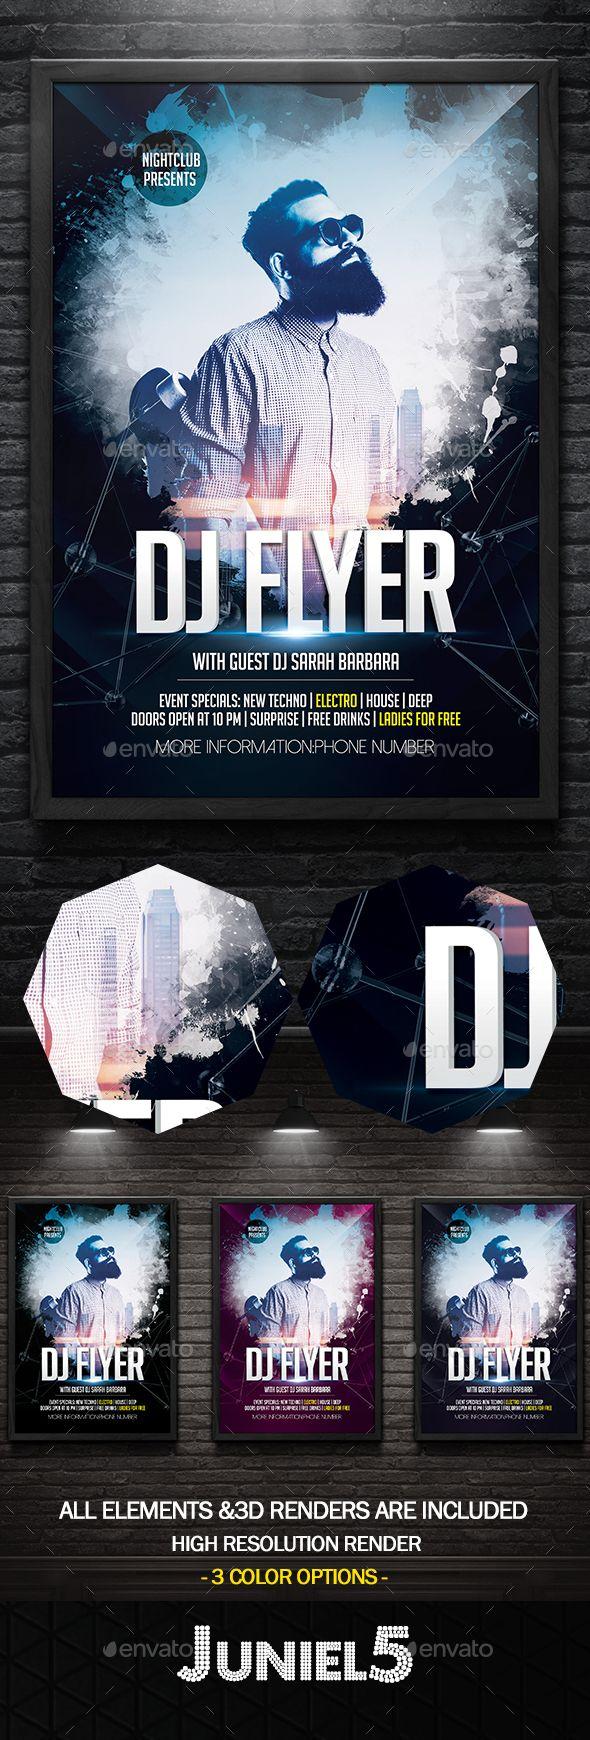 DJ Flyer Template PSD. Download here: http://graphicriver.net/item/dj-flyer/16244996?ref=ksioks